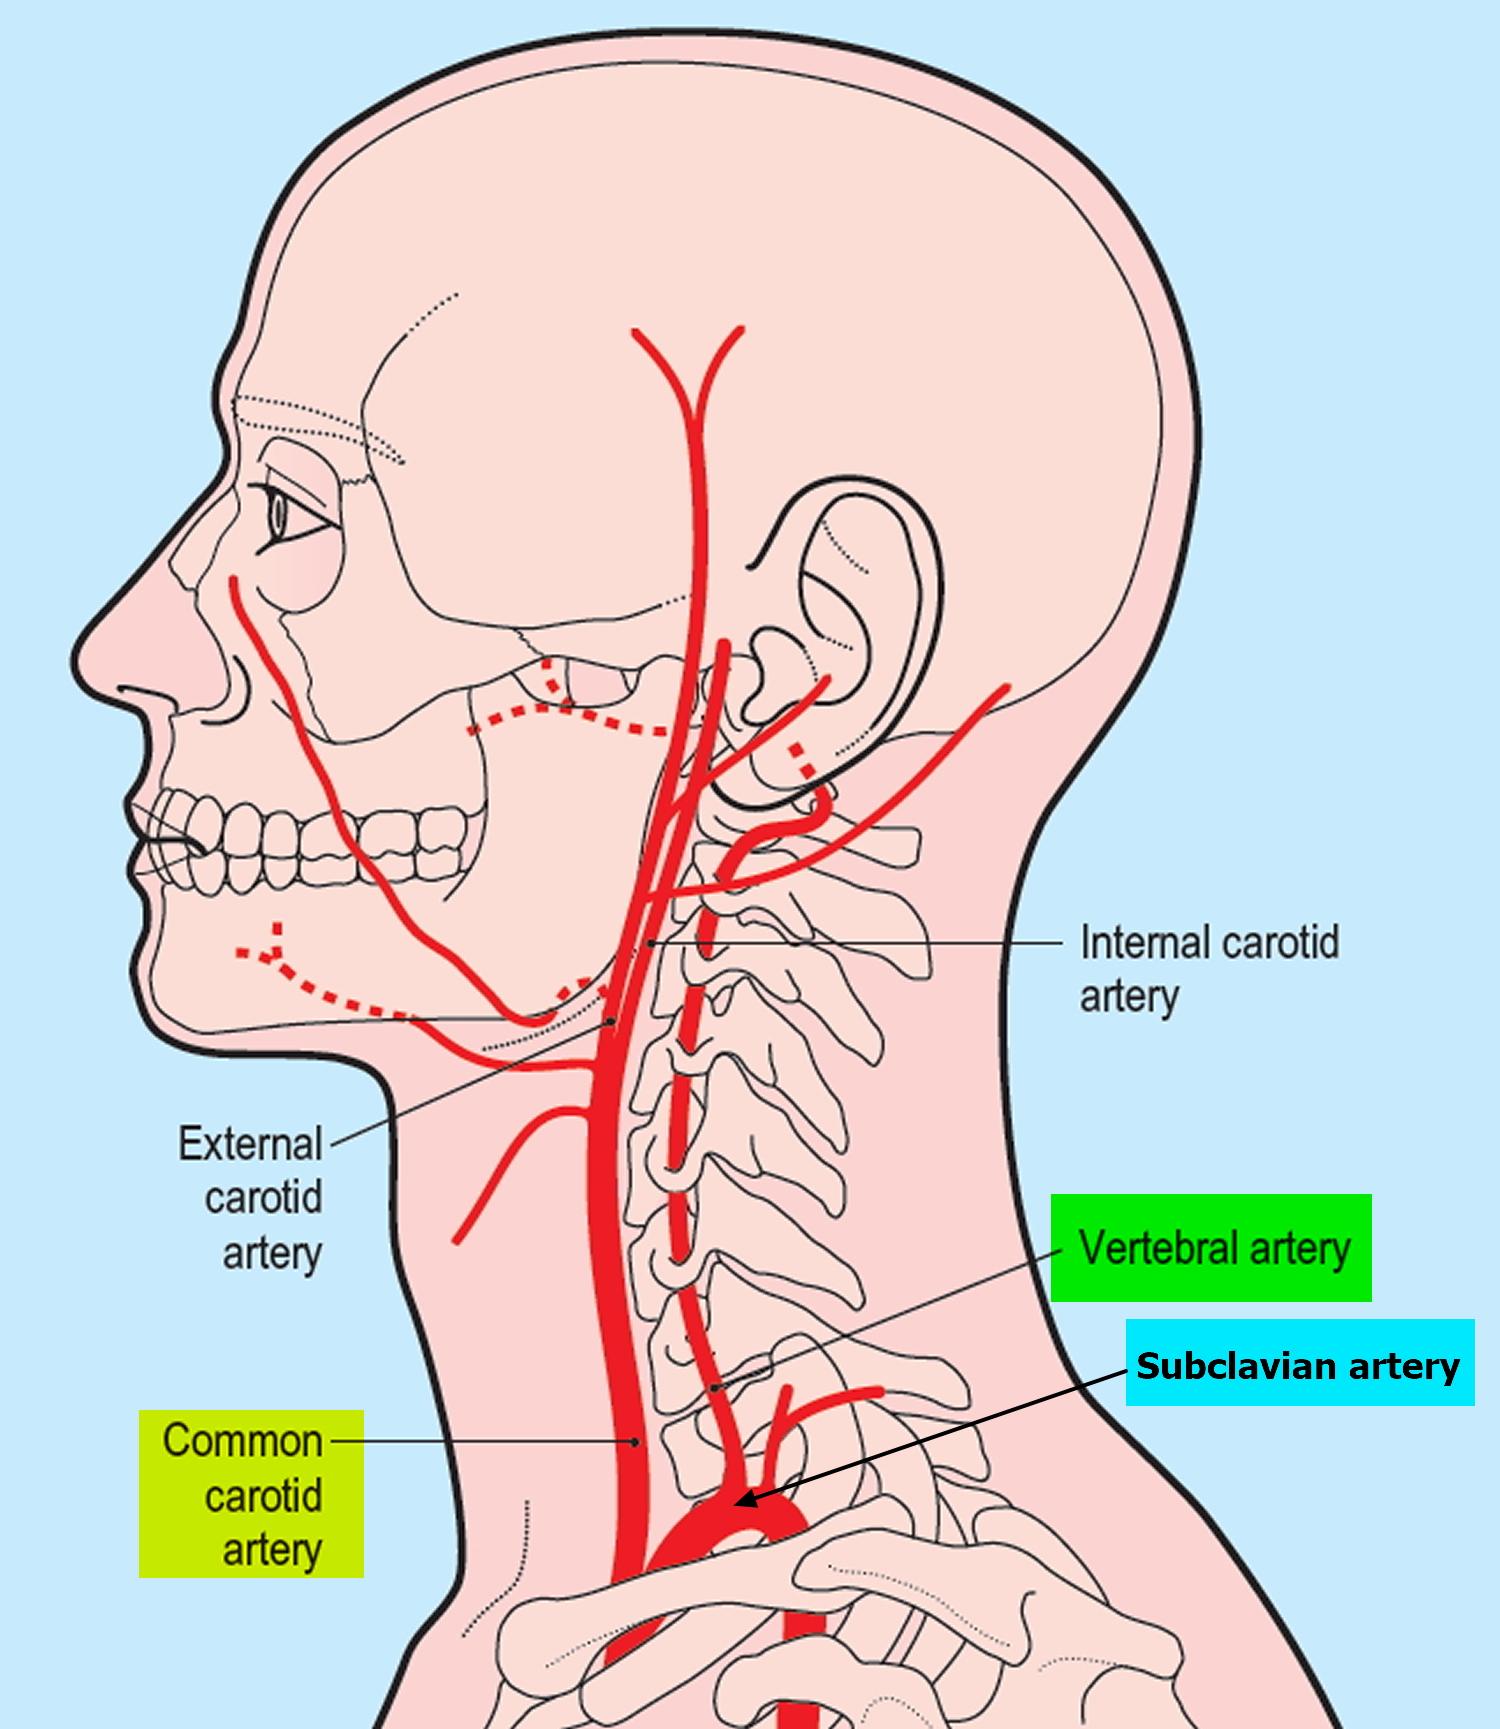 Vertebrobasilar system anatomy 515756 - follow4more.info